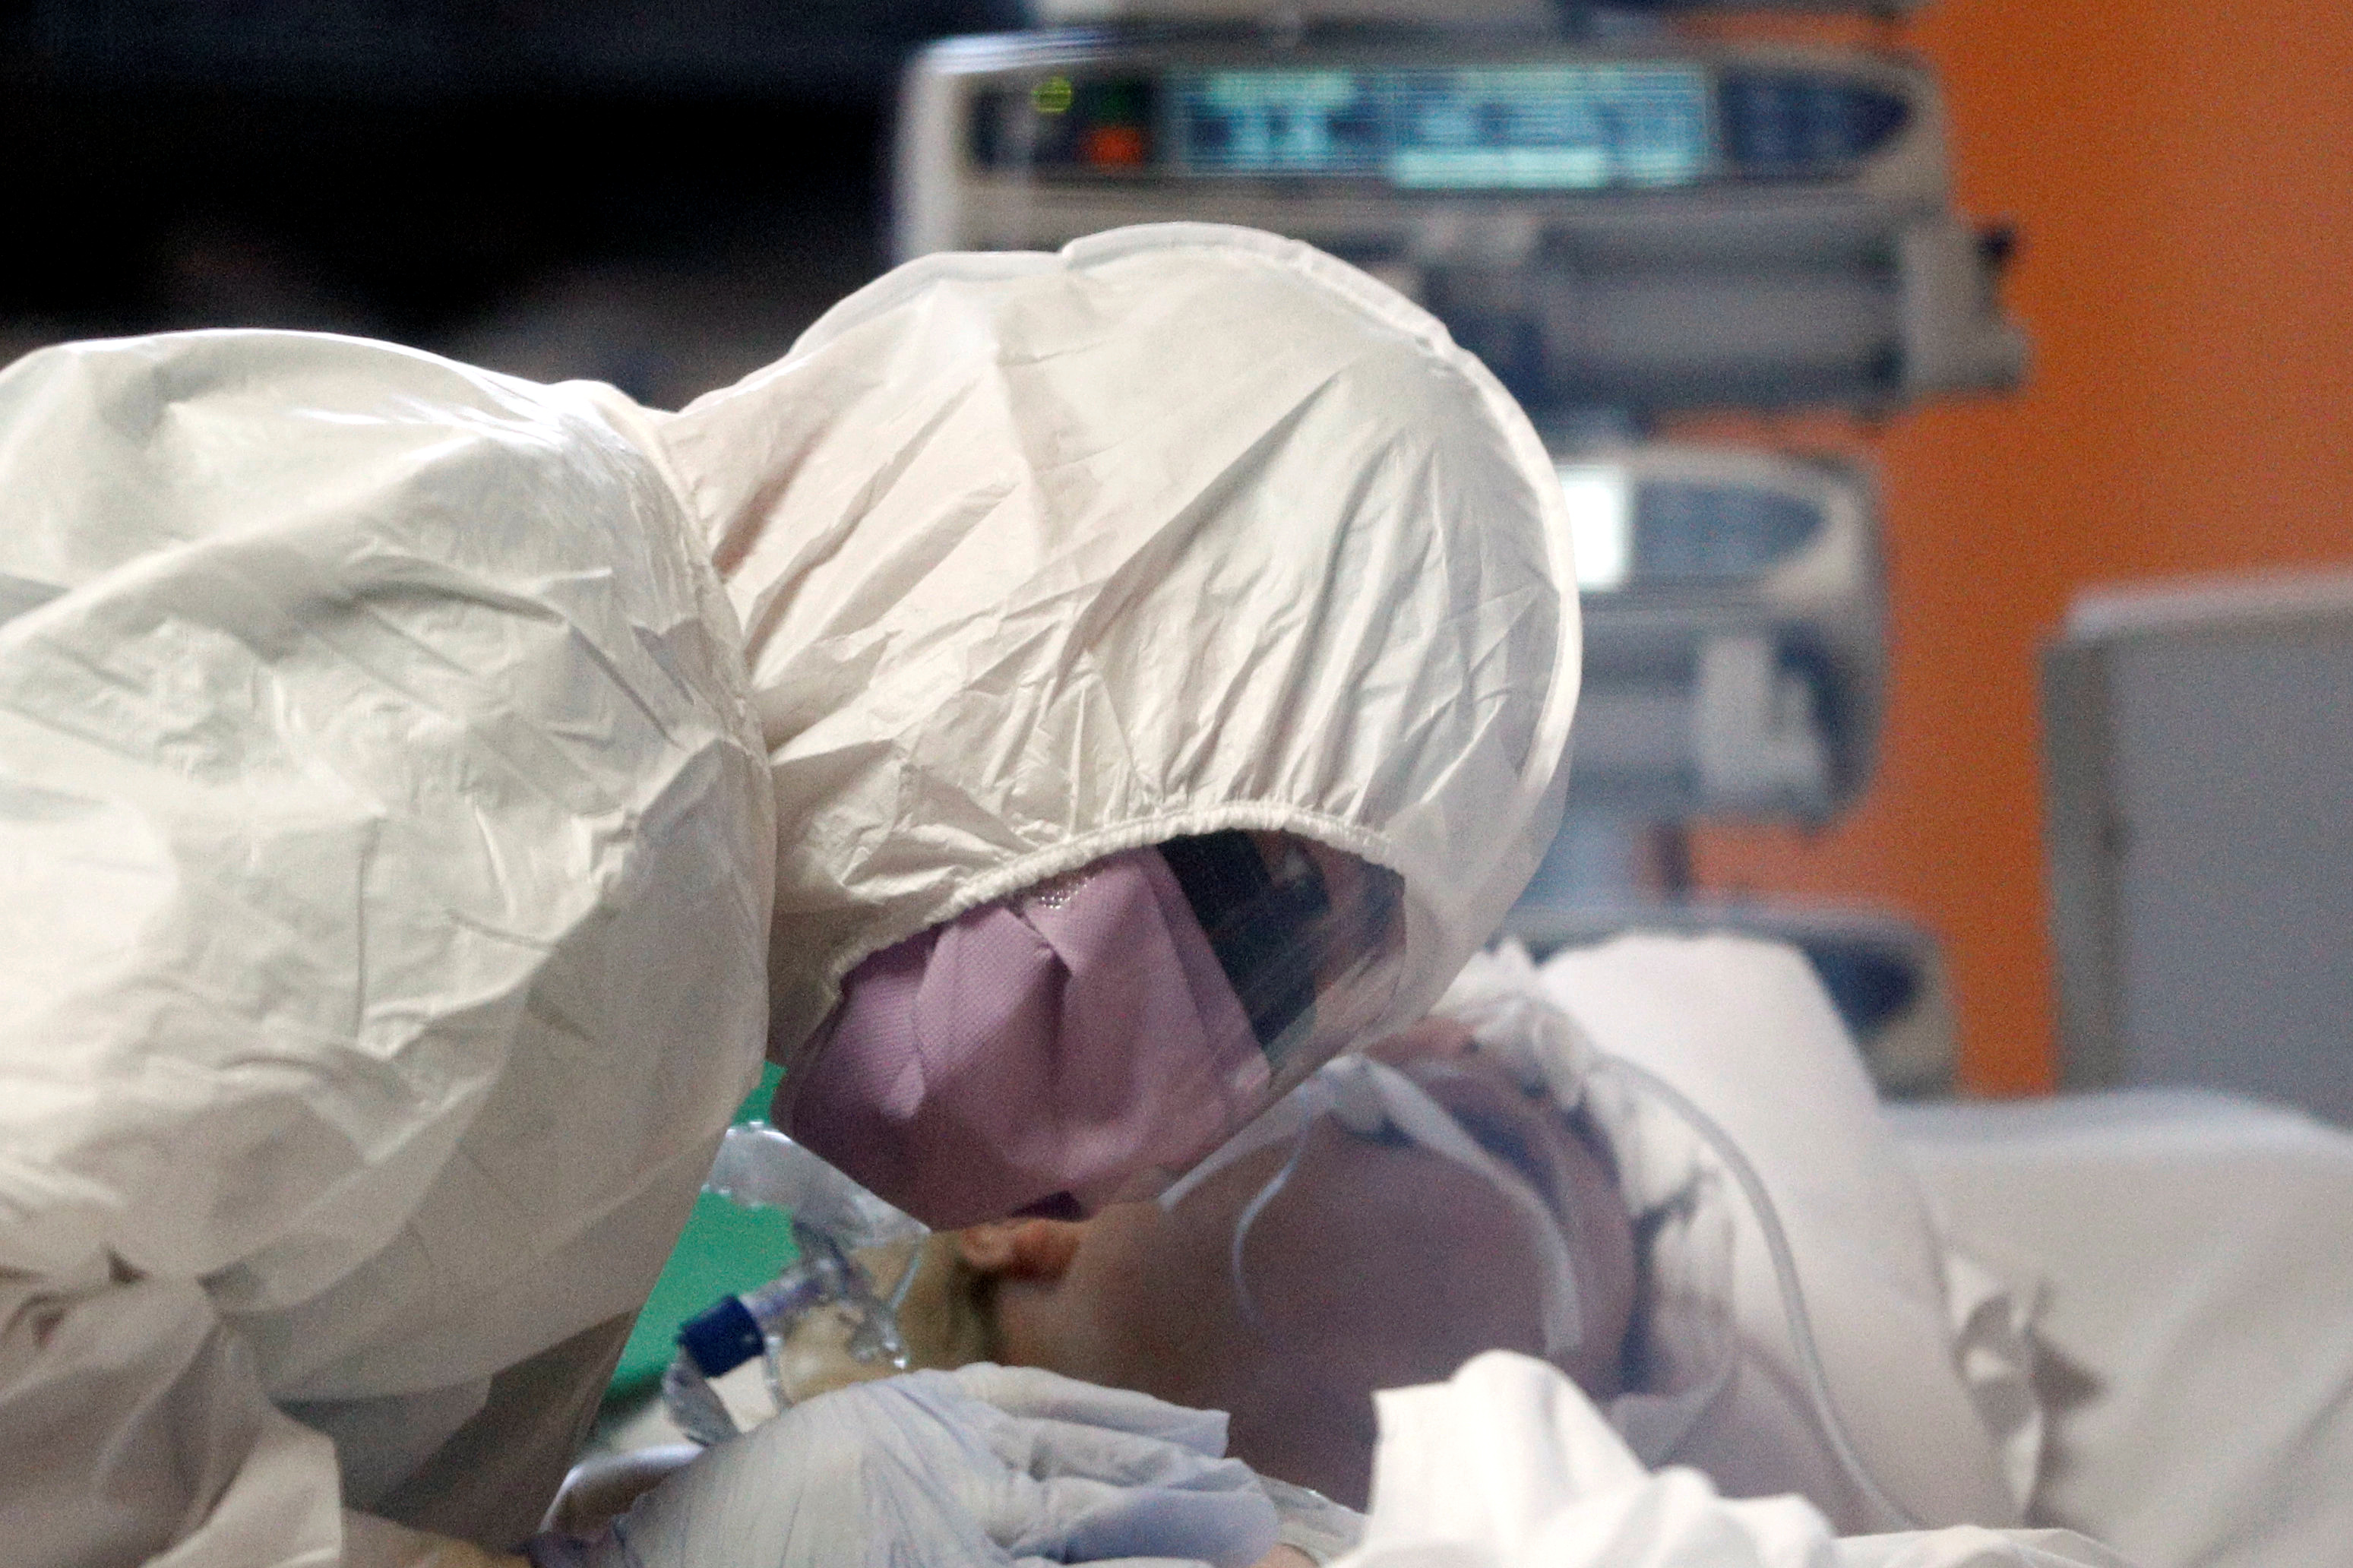 Una médica atiende a un paciente en Roma, Italia (REUTERS/Guglielmo Mangiapane)